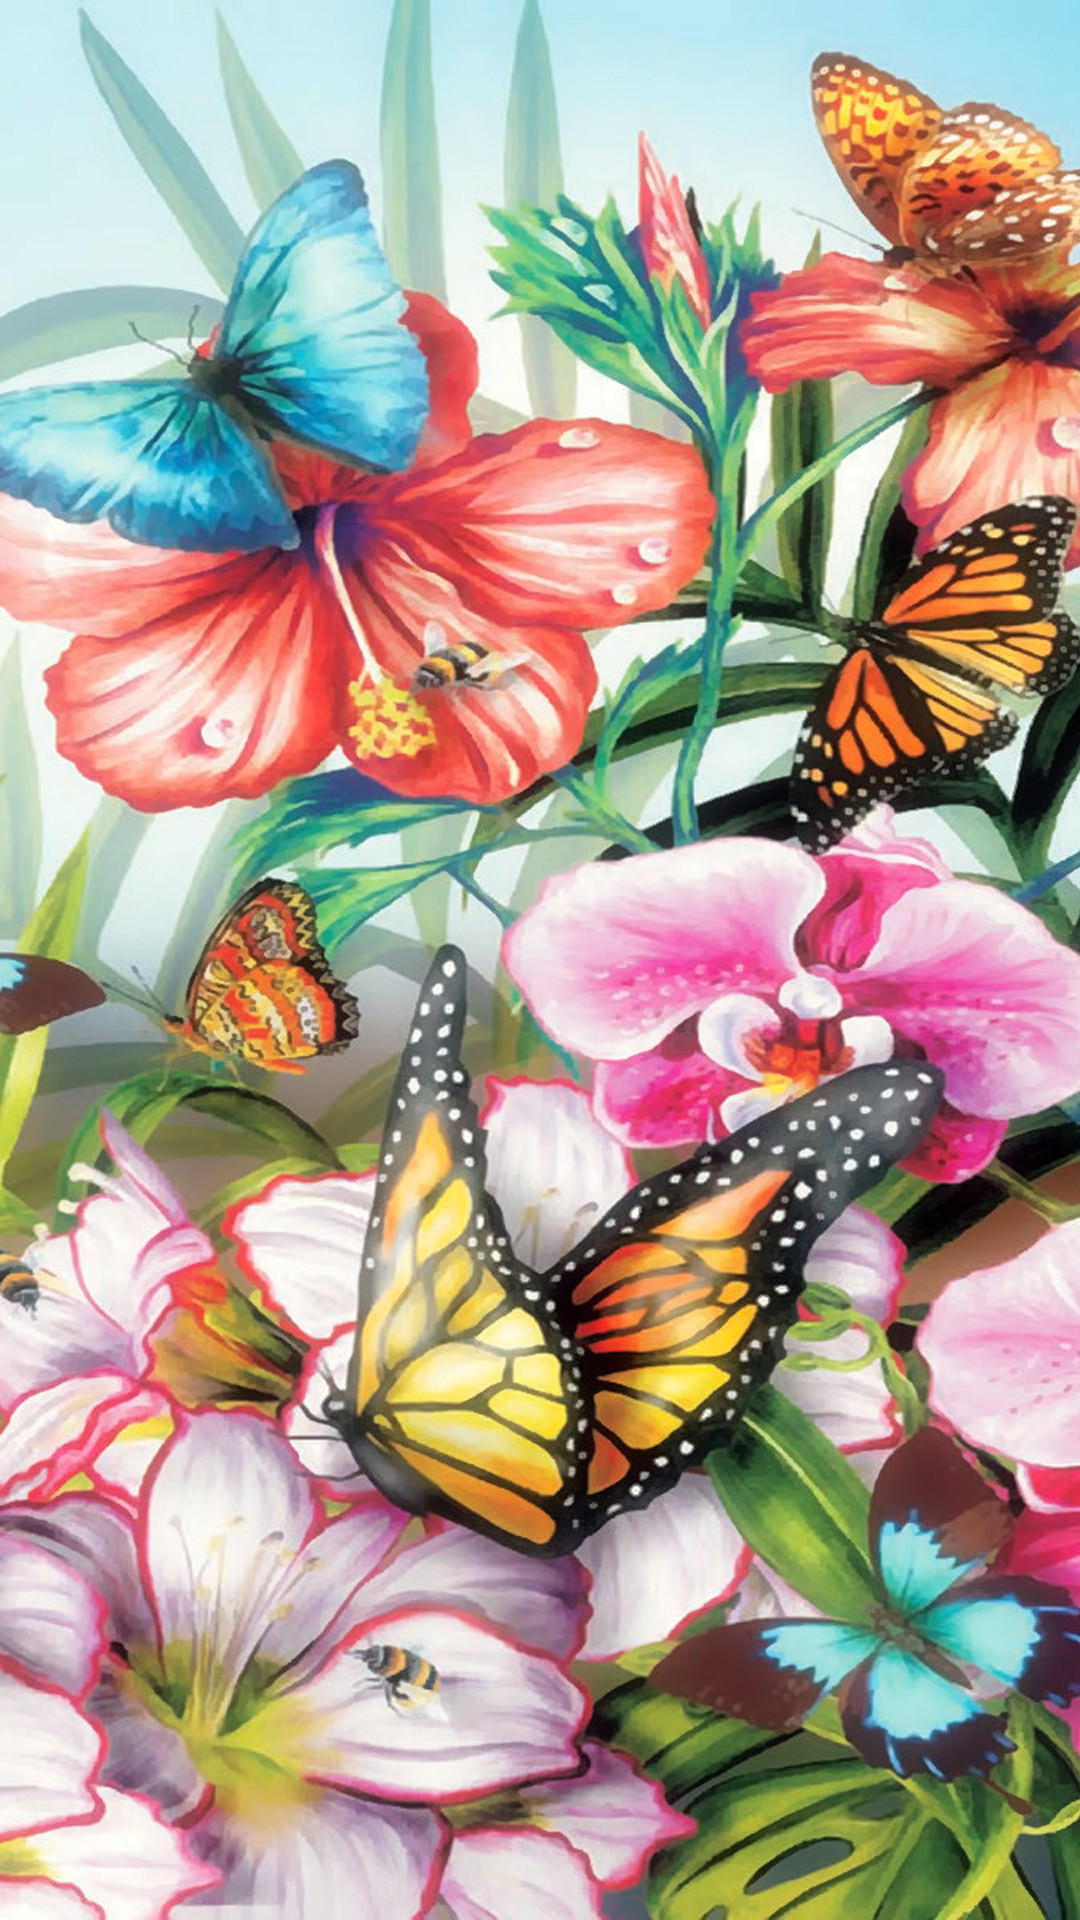 Color Butterflies iphone 6 plus Wallpaper, iPhone 6 Plus Wallpaper